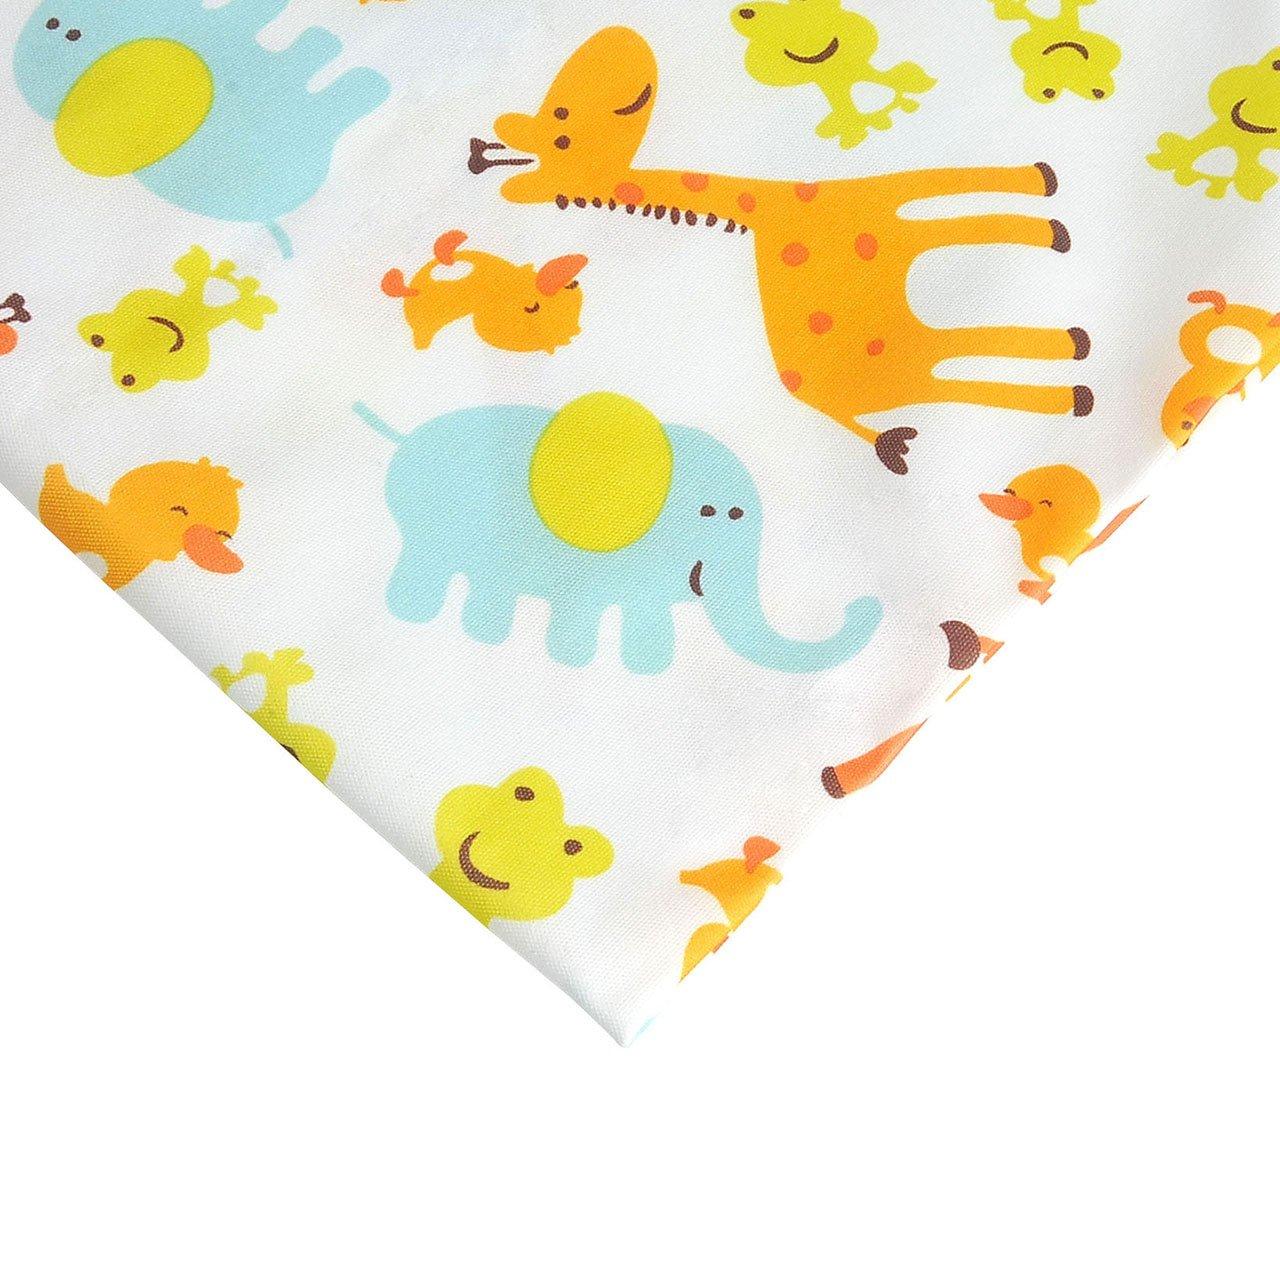 2 Bags Animals , 30cm*28cm CHIC DIARY Wet Dry Bag Baby Nappy Organizer Bag Reusable Washable Cloth Diaper Bag